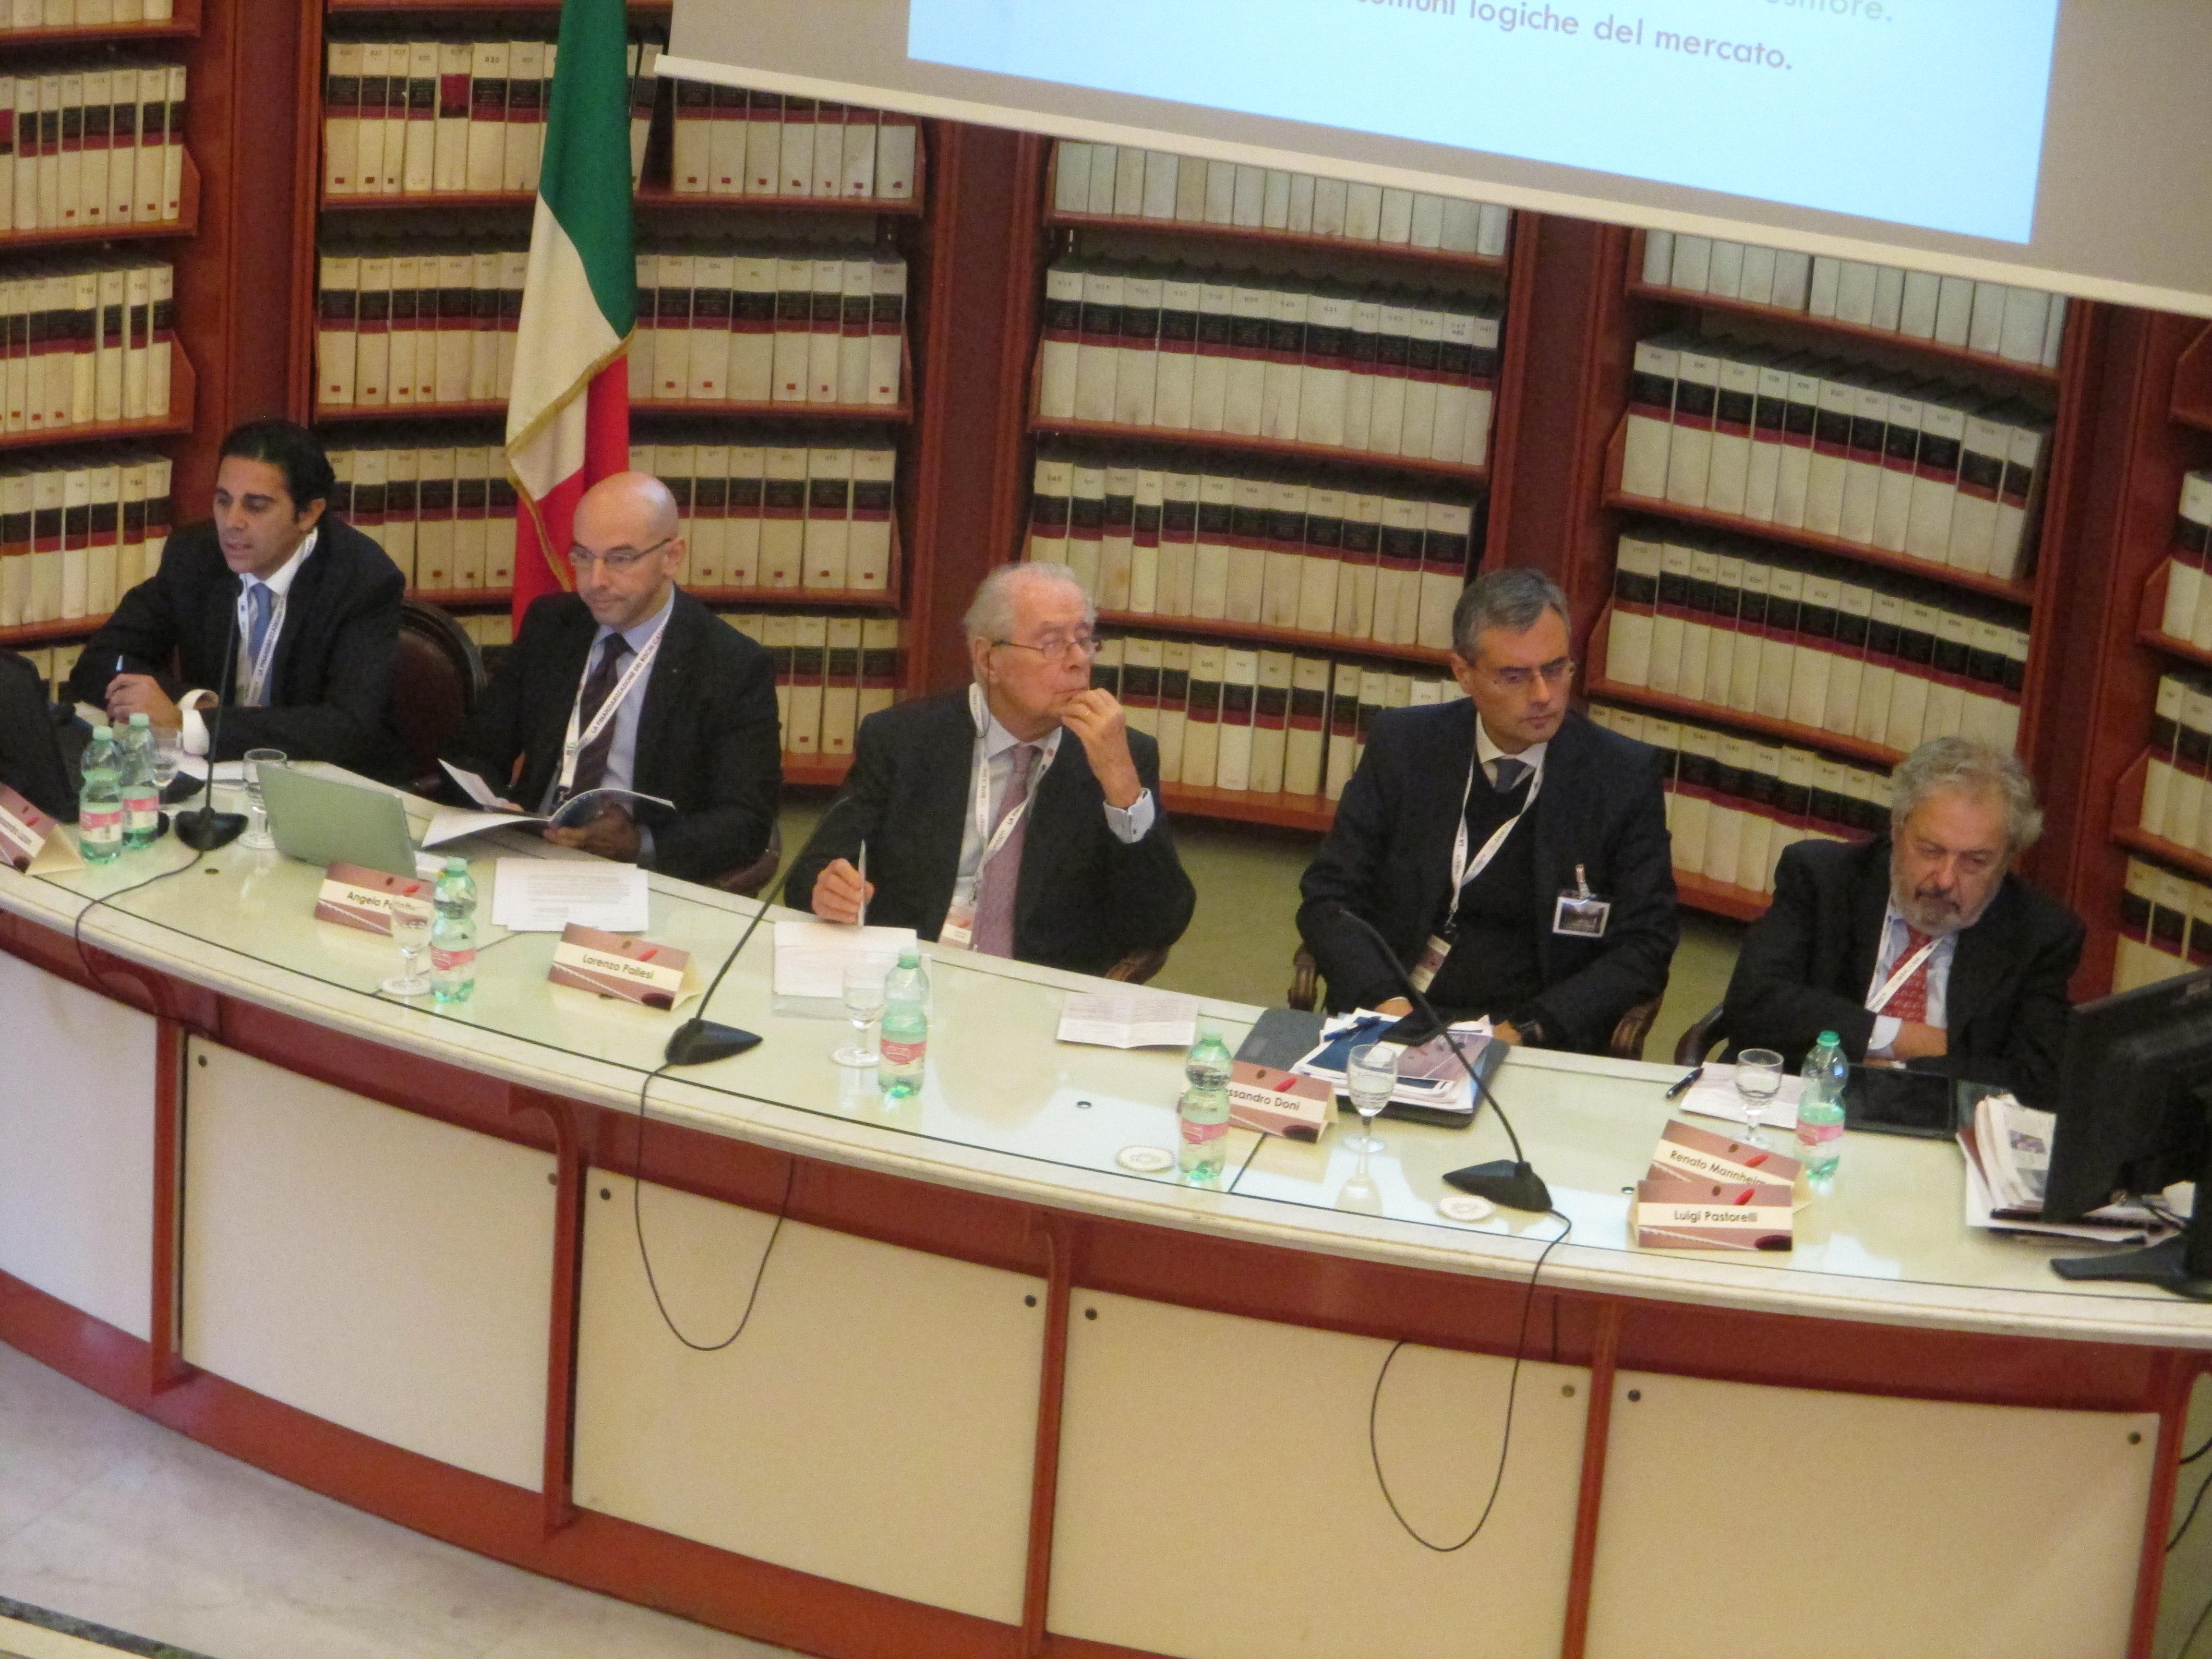 Angelo paletta news for Rassegna stampa camera deputati